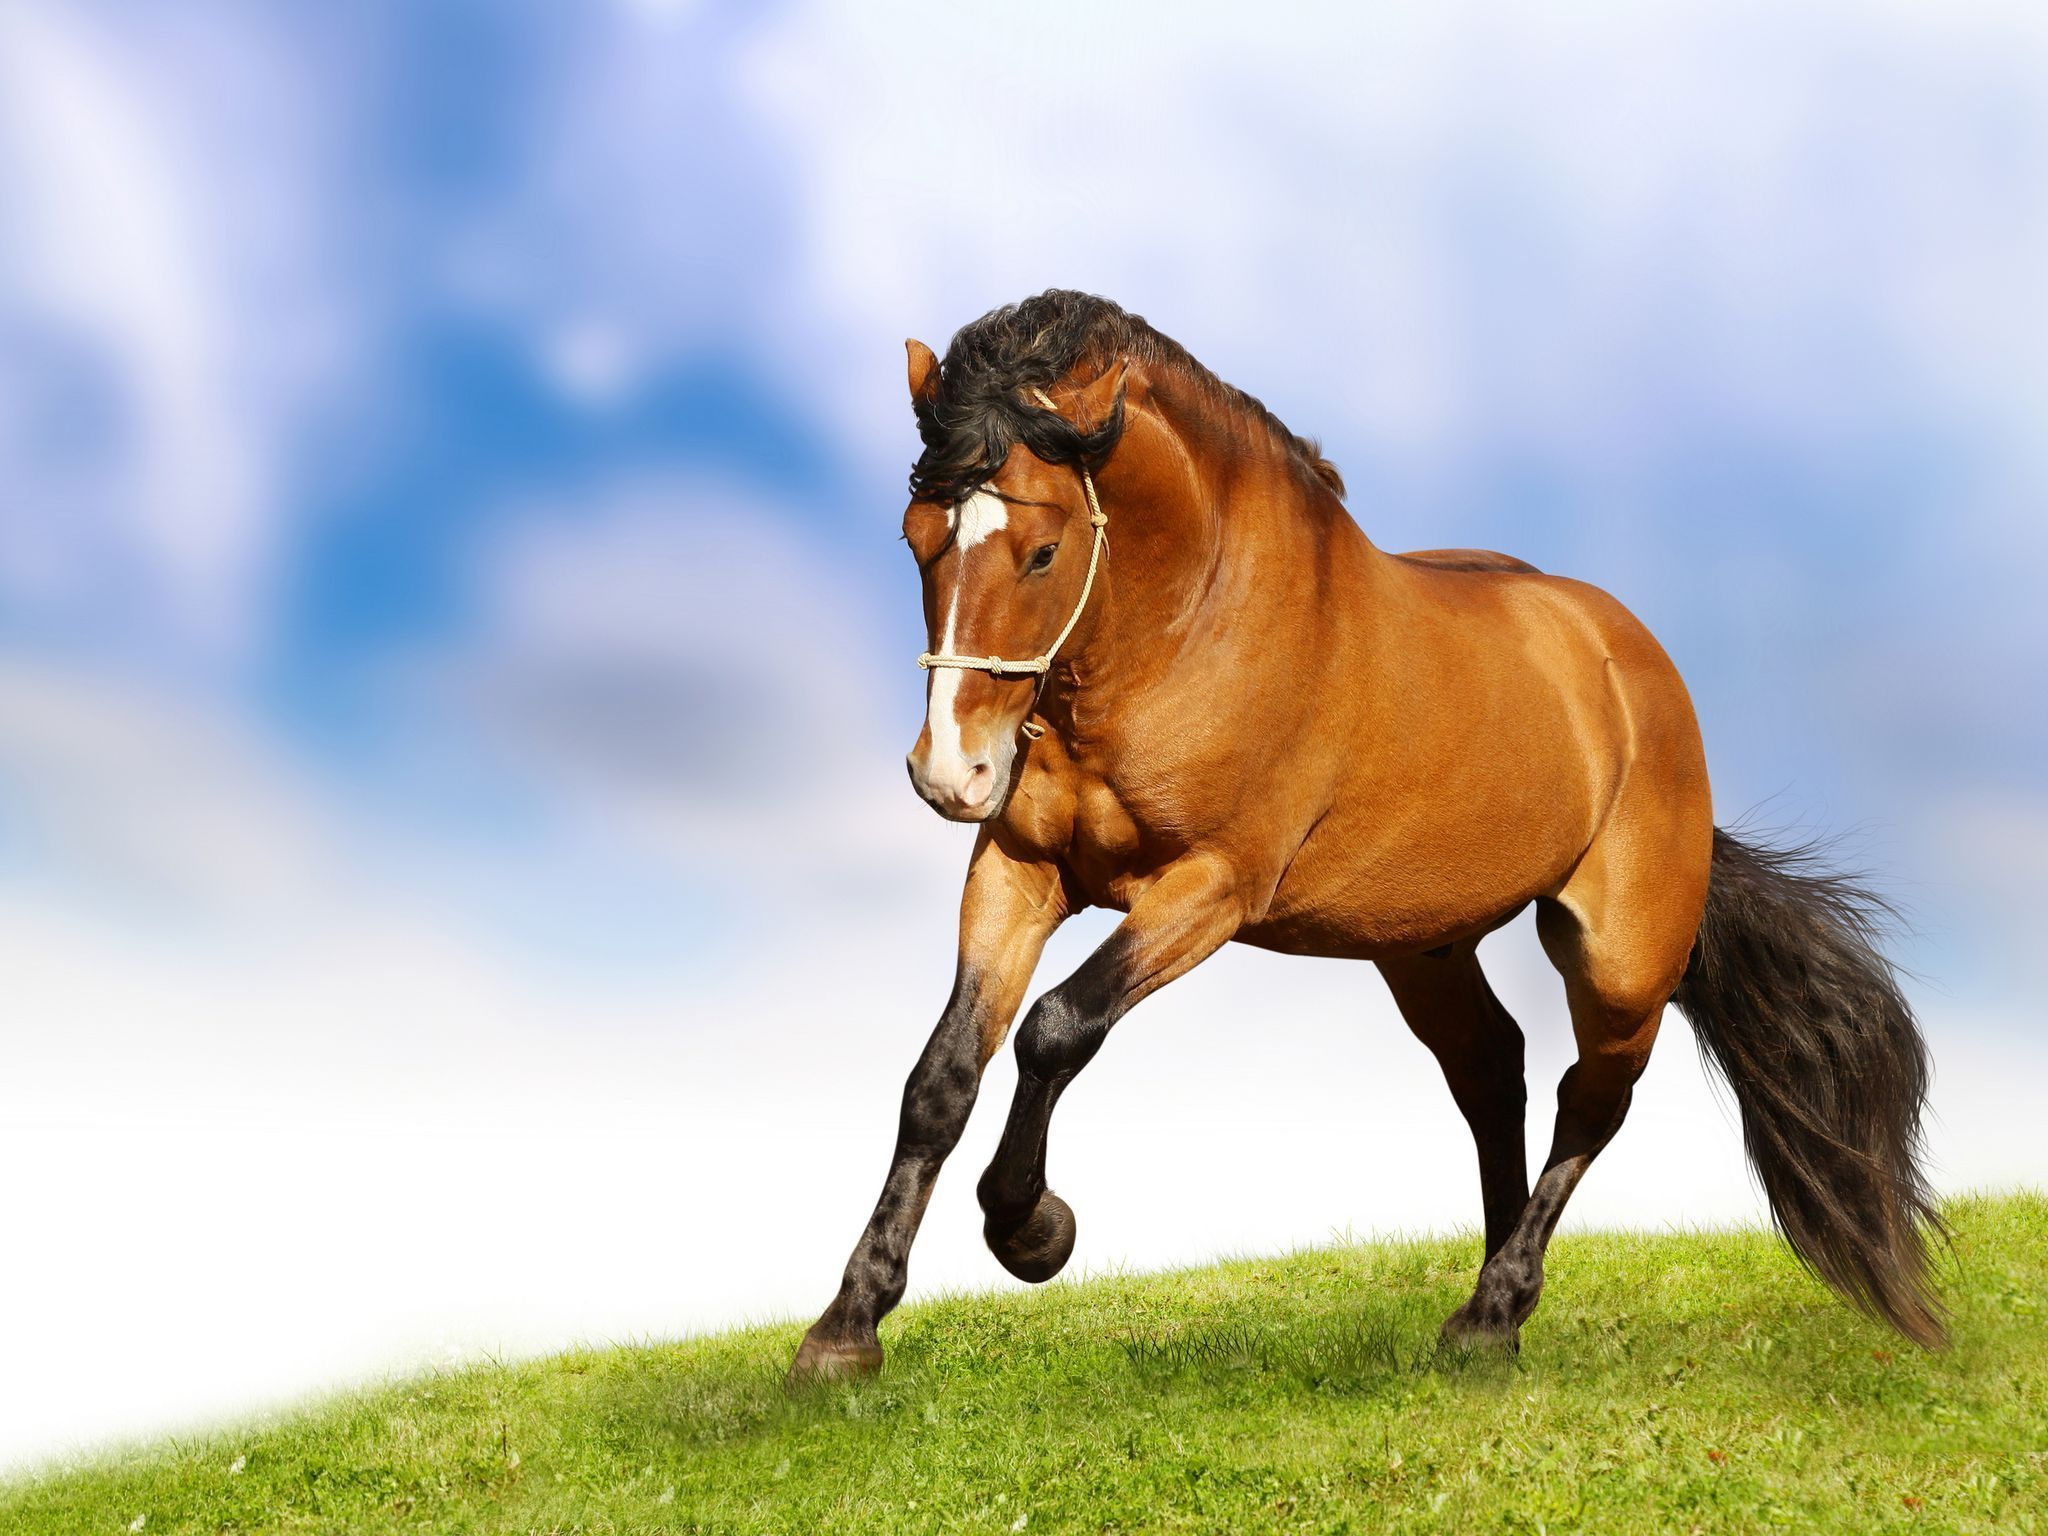 Simple Wallpaper Horse Iphone 5s - 60a95a02eb5e634dcd91fda06dee658d  Picture_605219.jpg